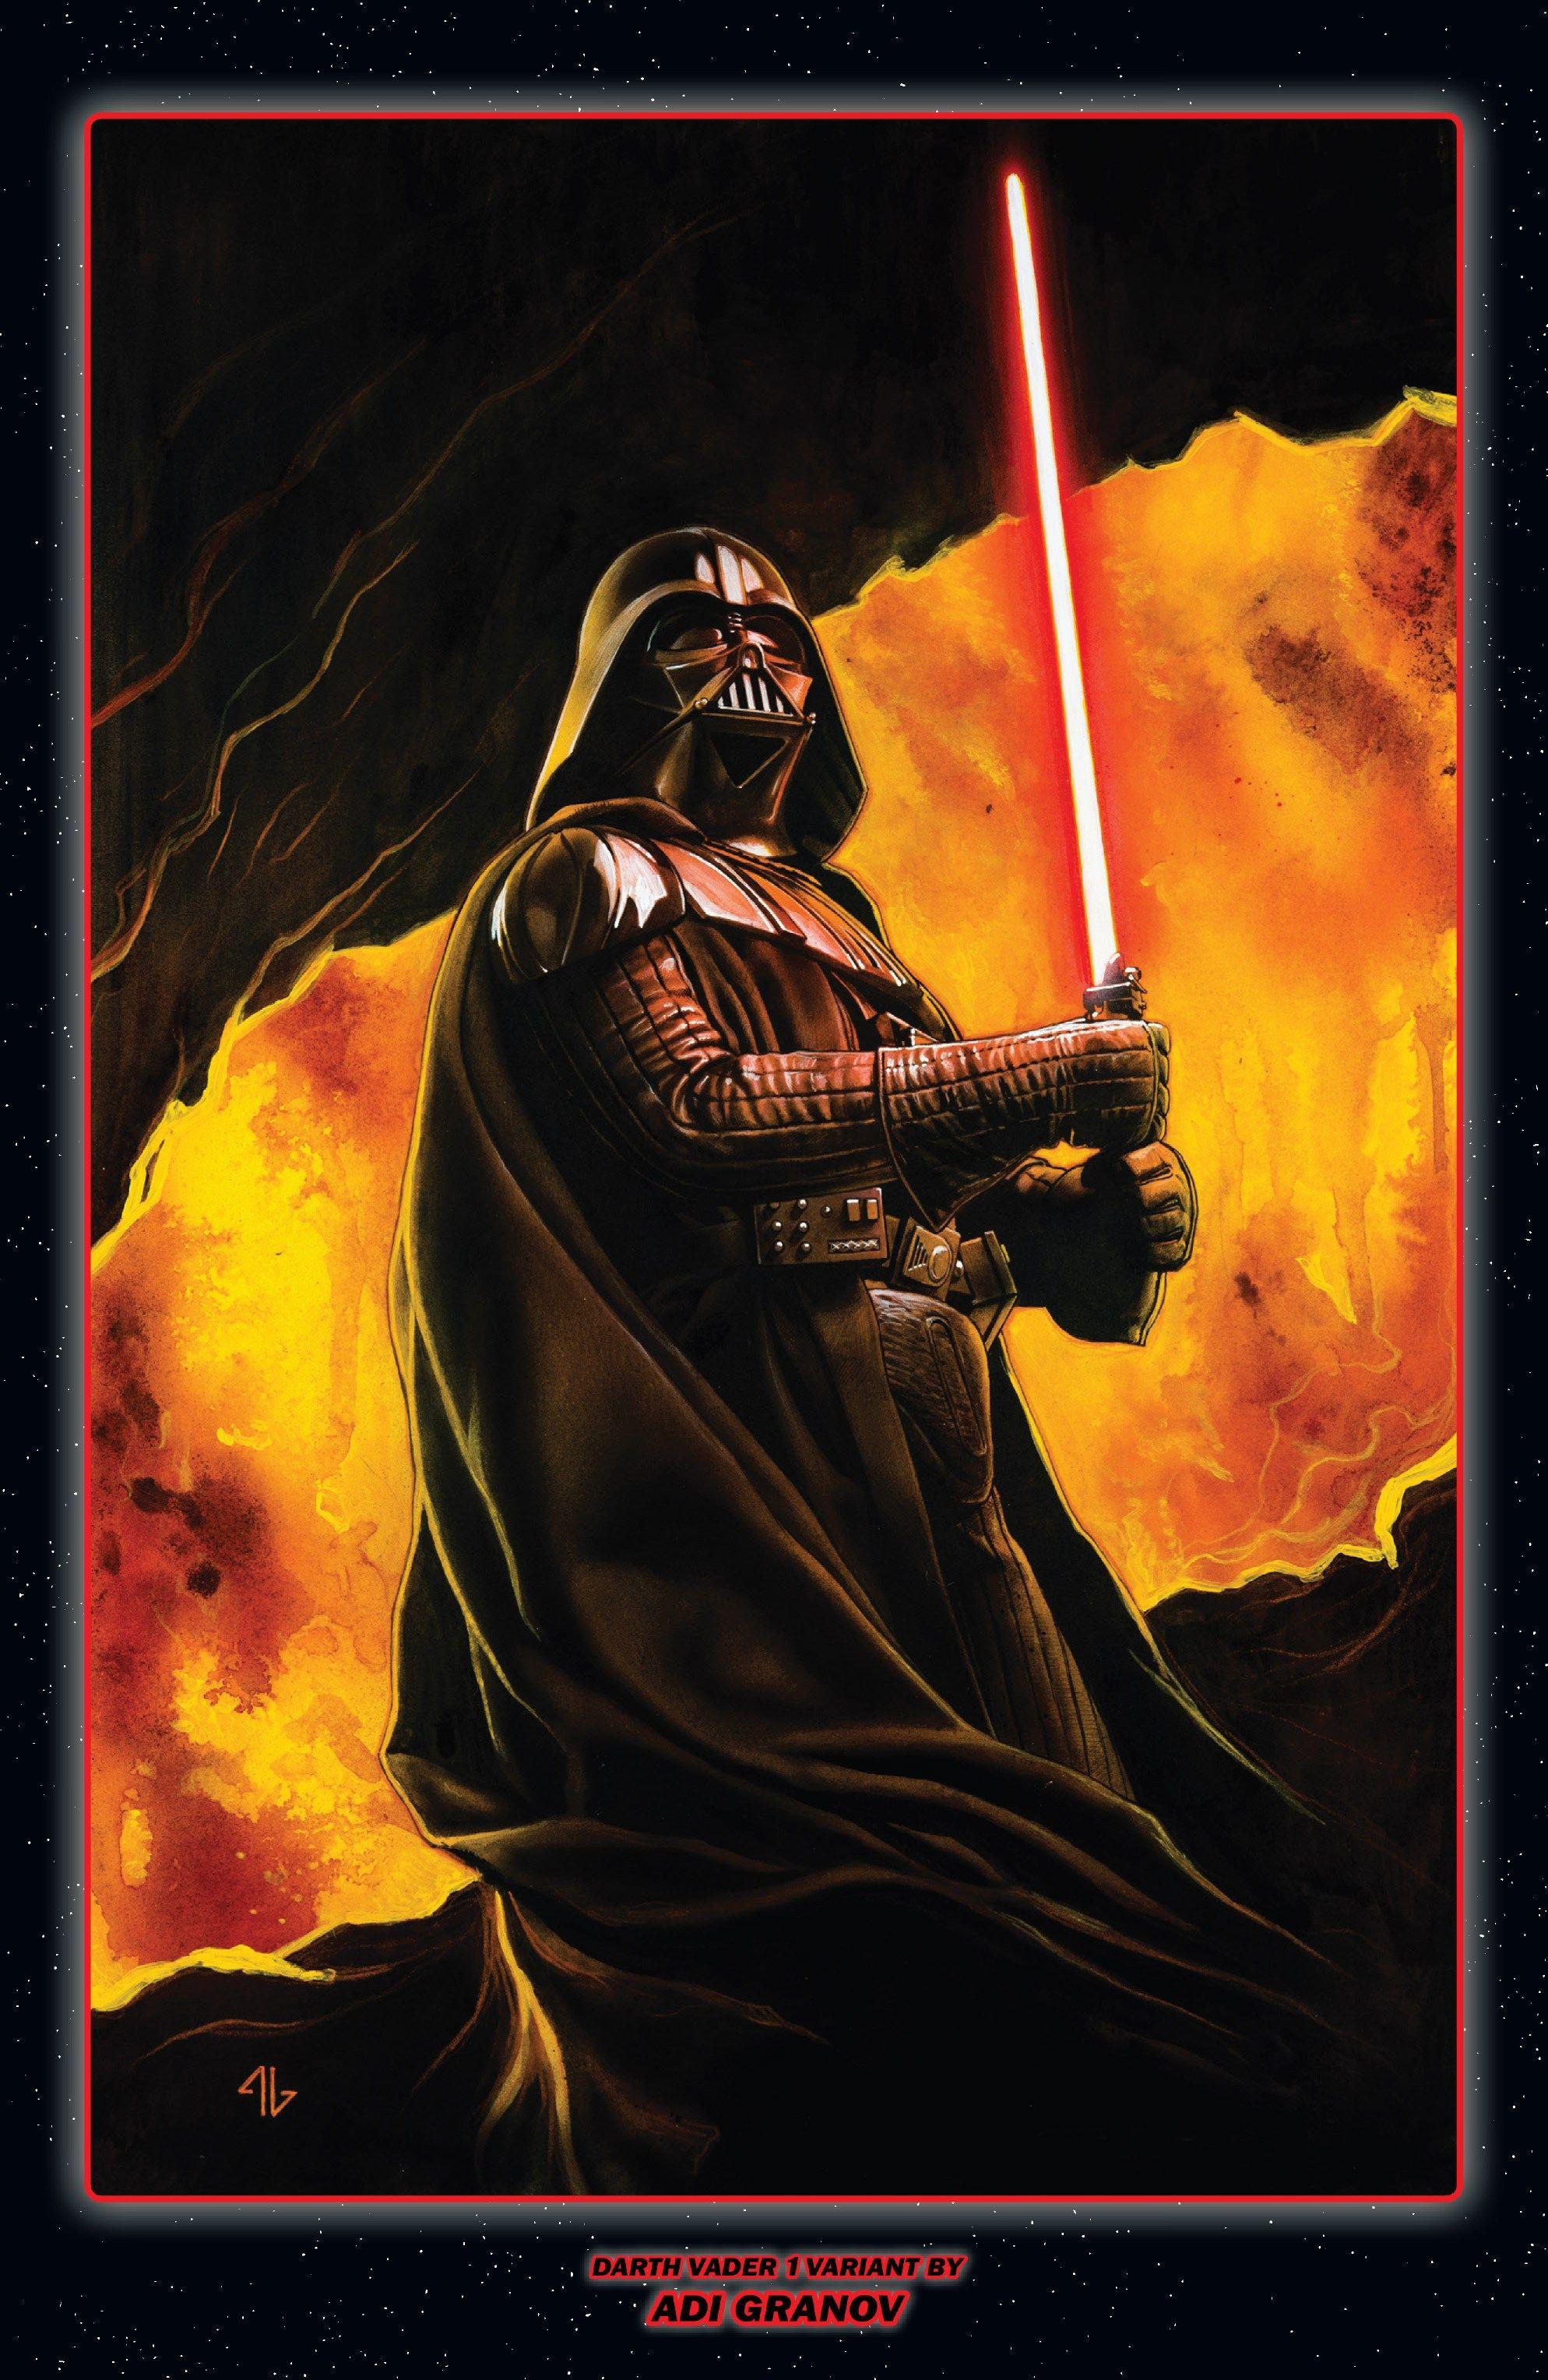 Star Wars Darth Vader Imperial Machine Star Wars Darth Vader Dark Lord Of The Sith Vol 1 Imp Dark Lord Of The Sith Star Wars Villains Star Wars Comics